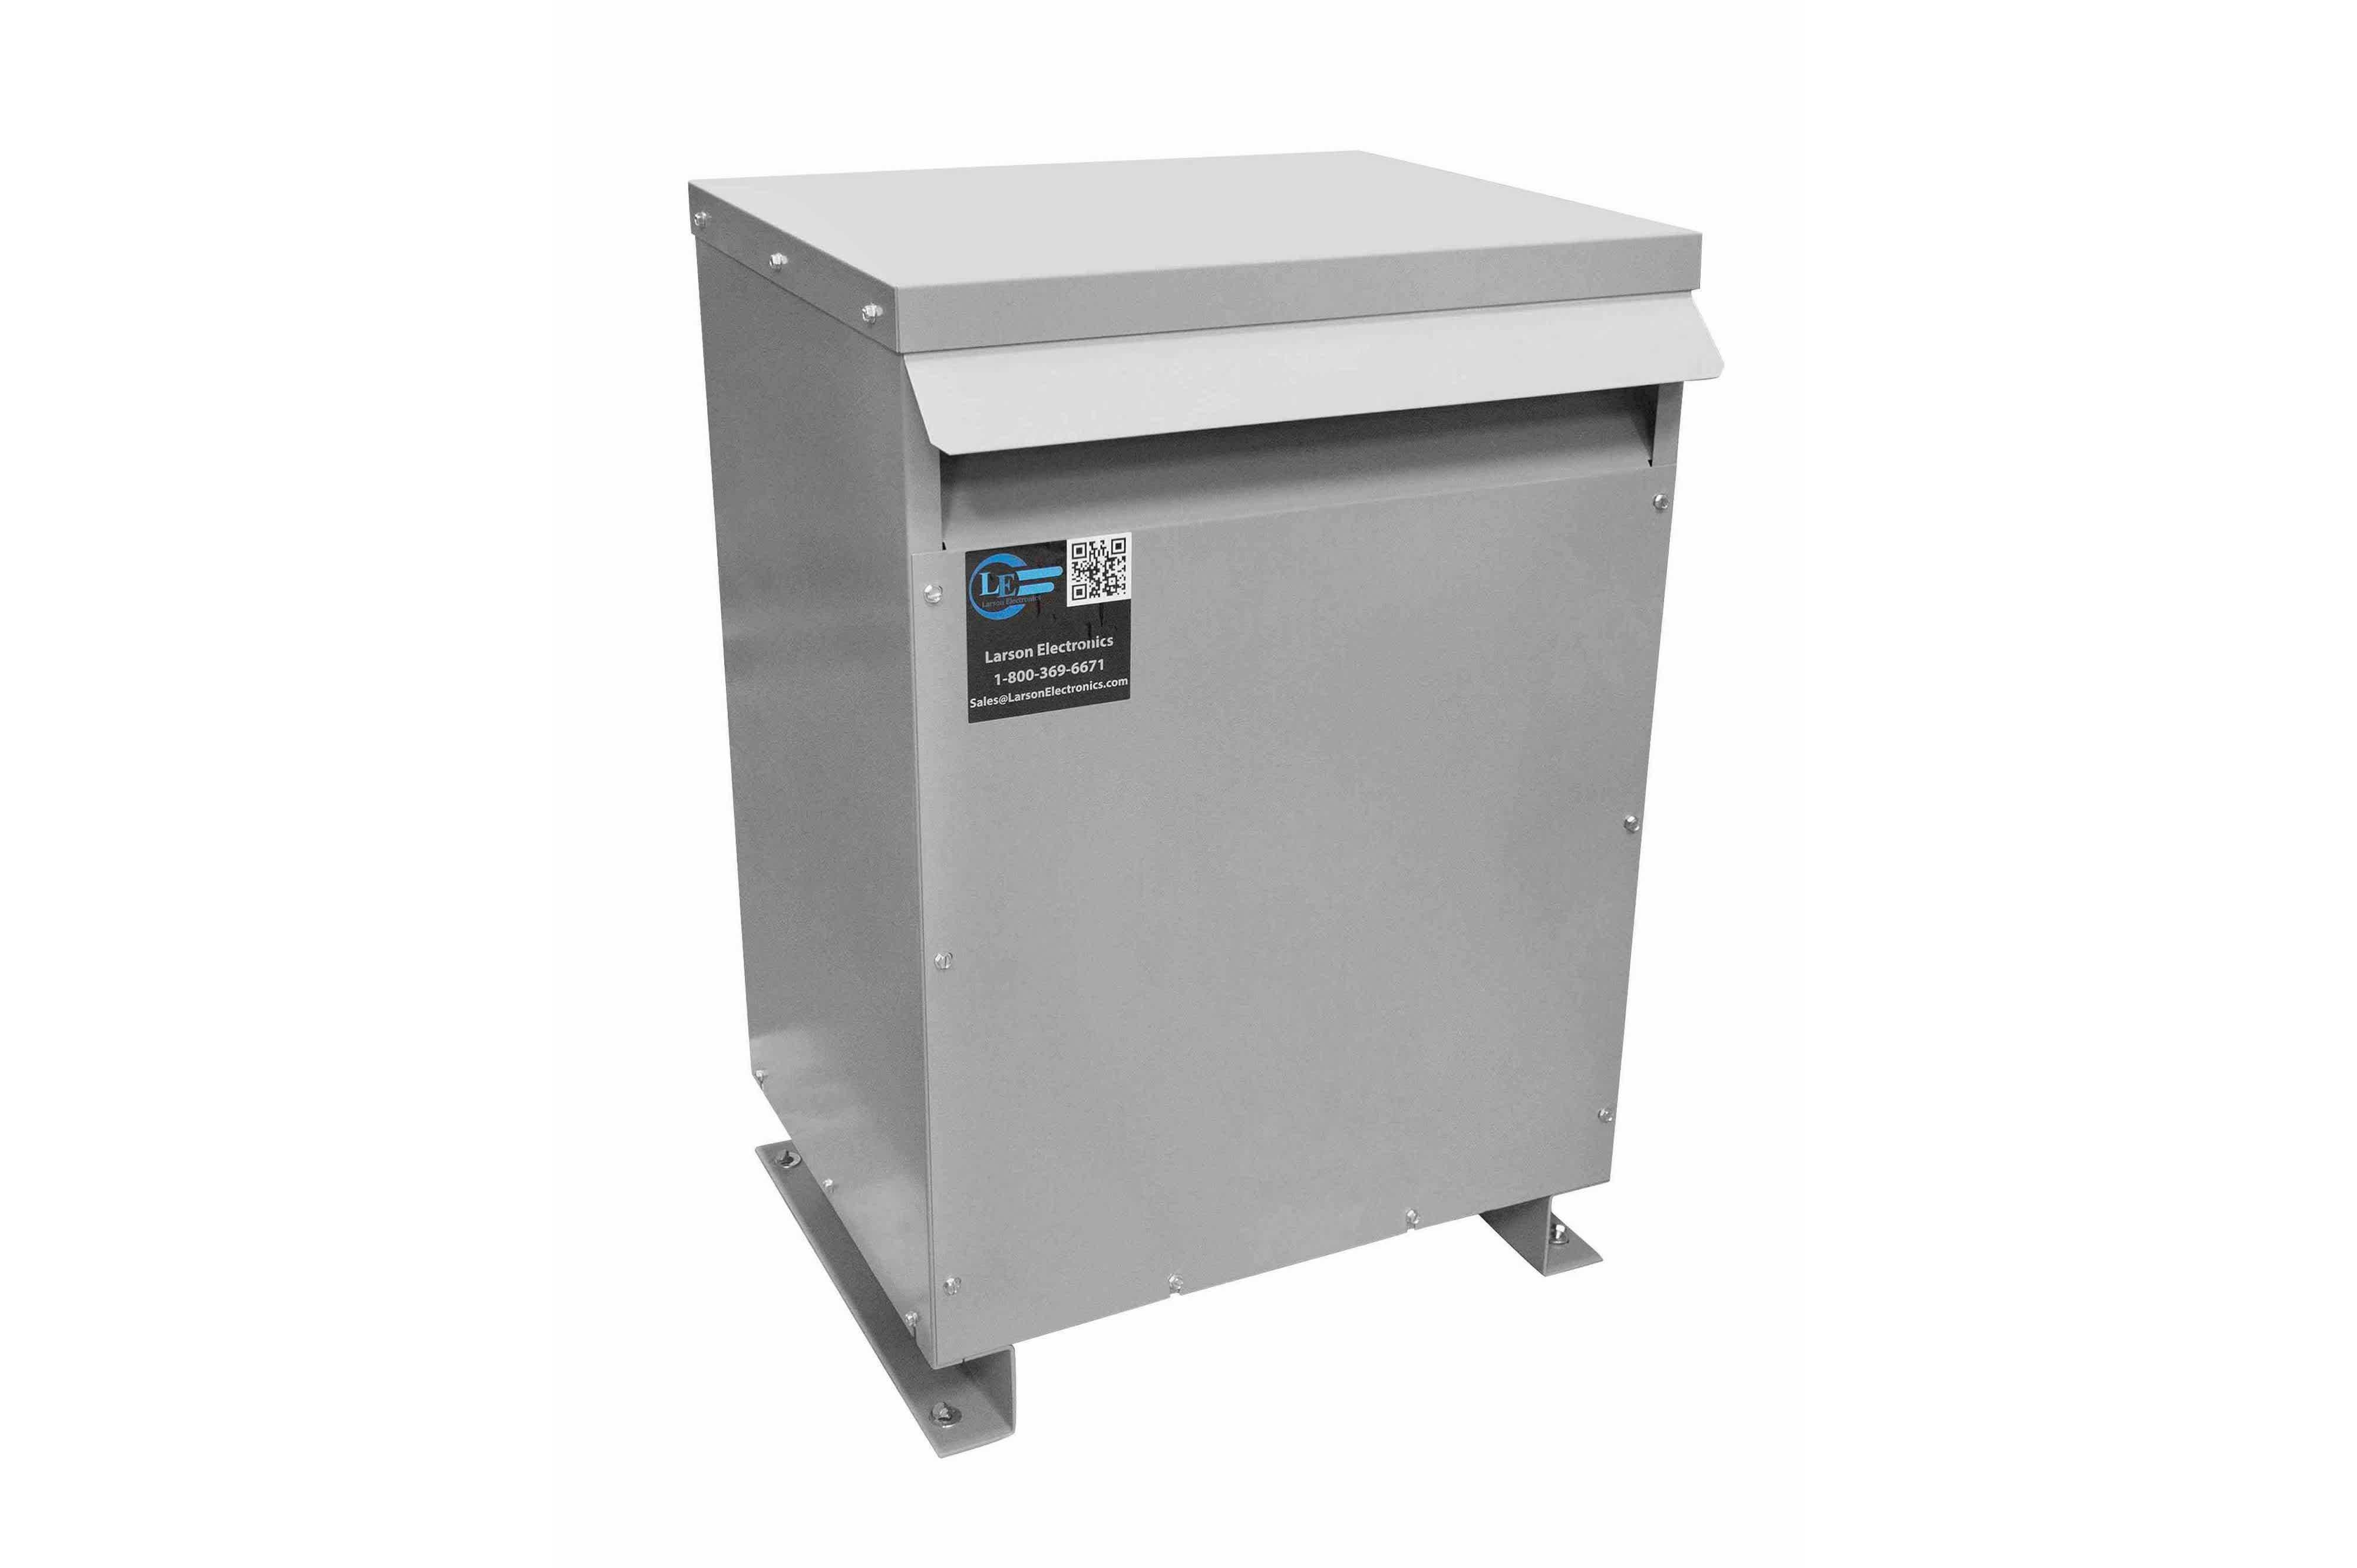 38 kVA 3PH Isolation Transformer, 460V Wye Primary, 400V Delta Secondary, N3R, Ventilated, 60 Hz